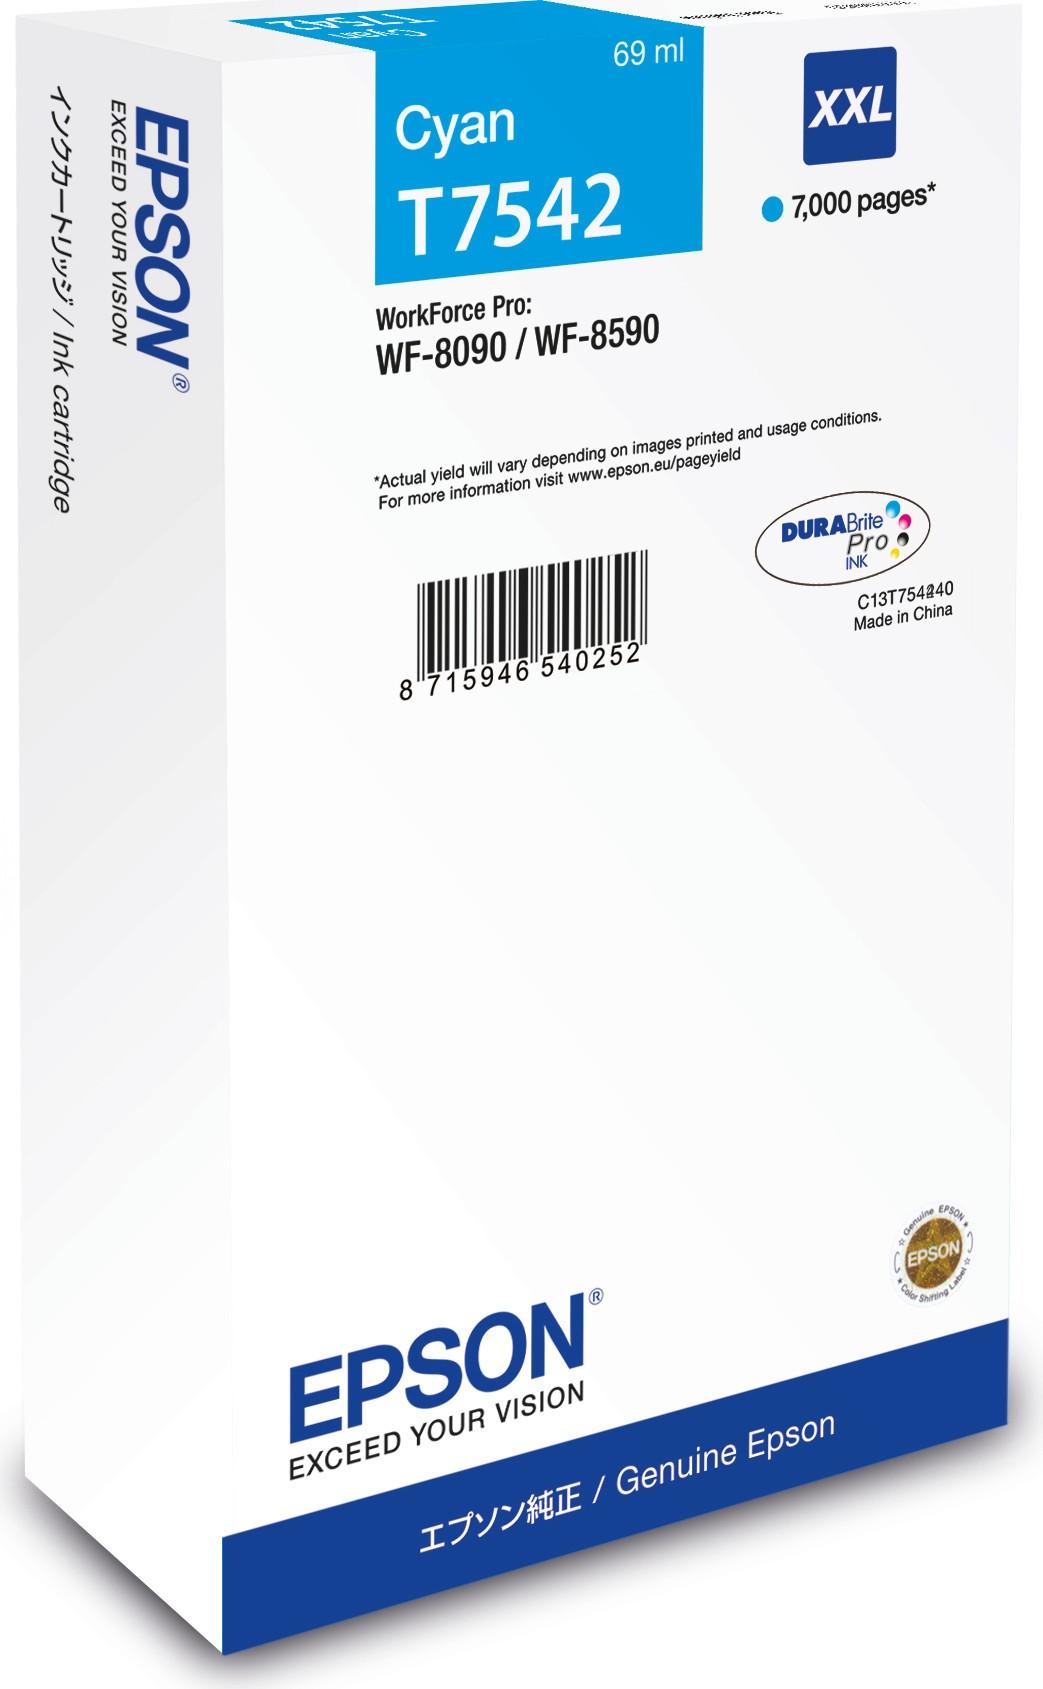 Cartus inkjet Epson T7542 XXL Cyan